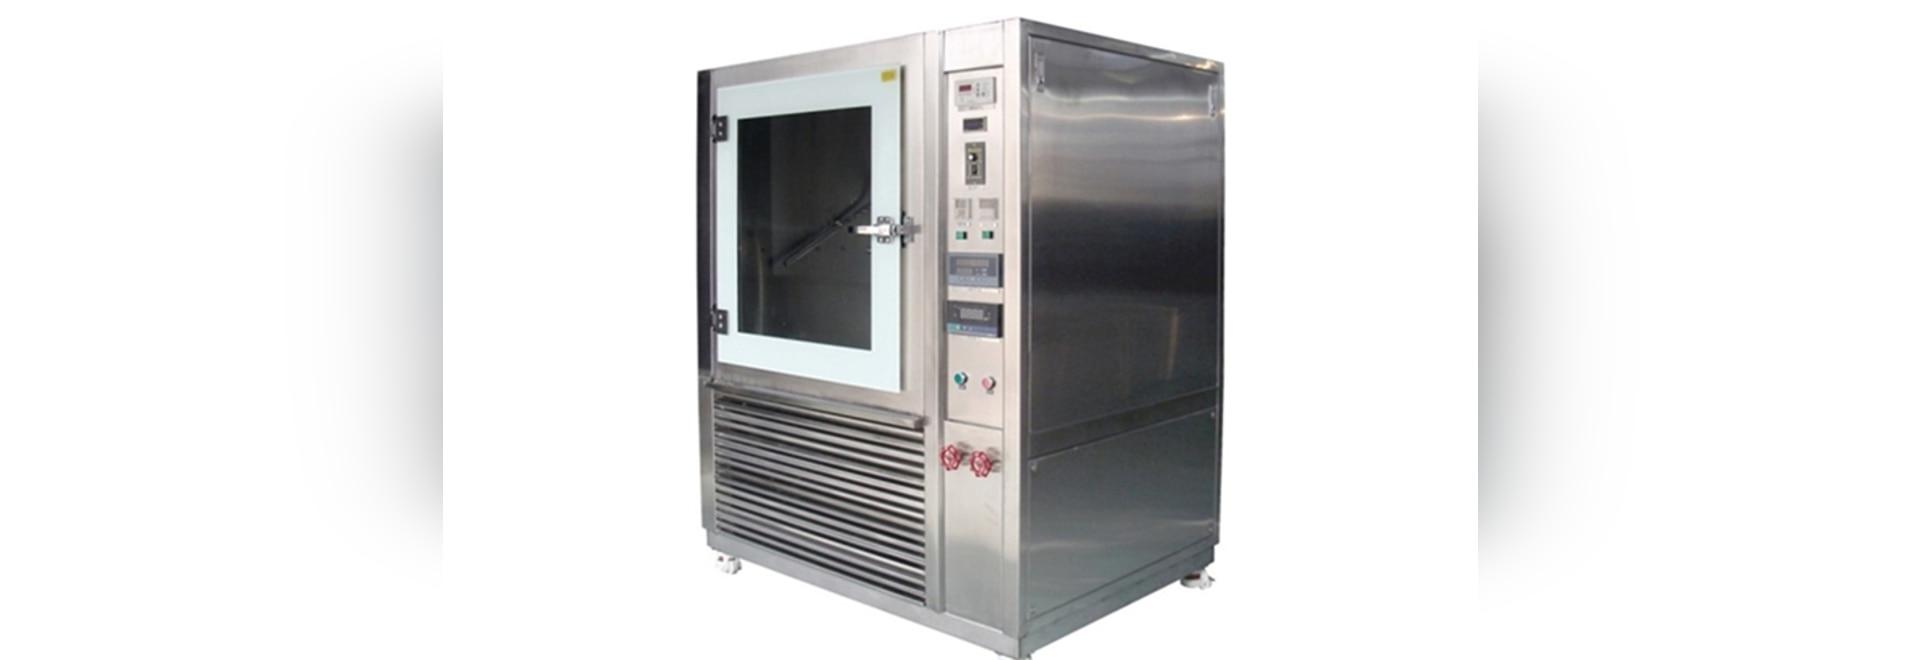 RT-1000A Rain Spray Test Chamber